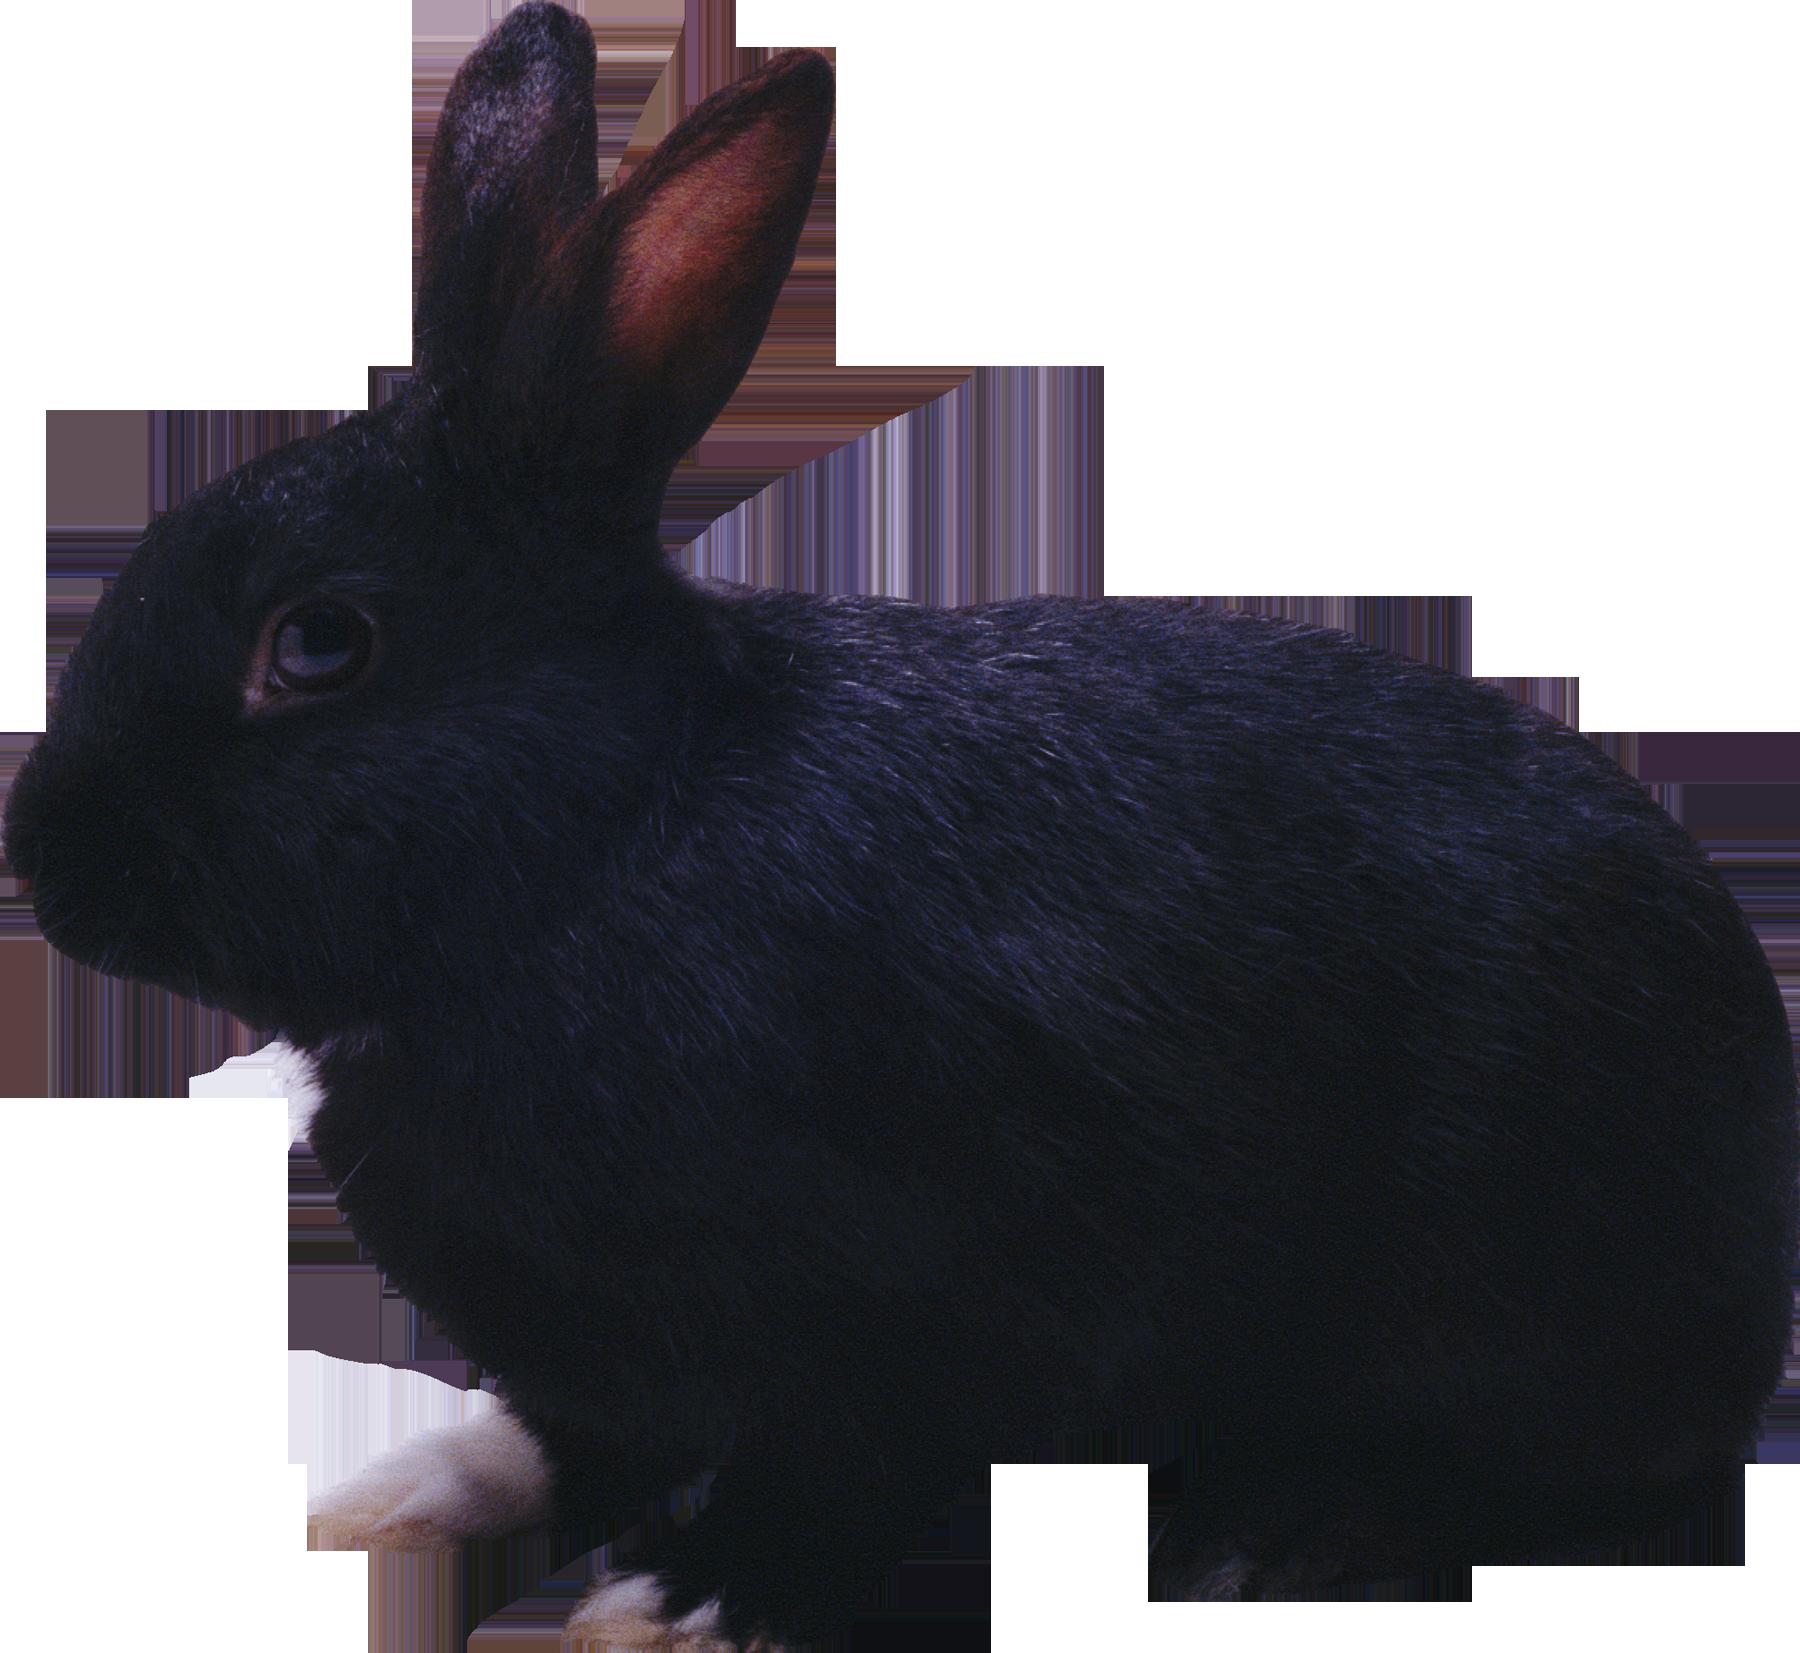 Black rabbit #2